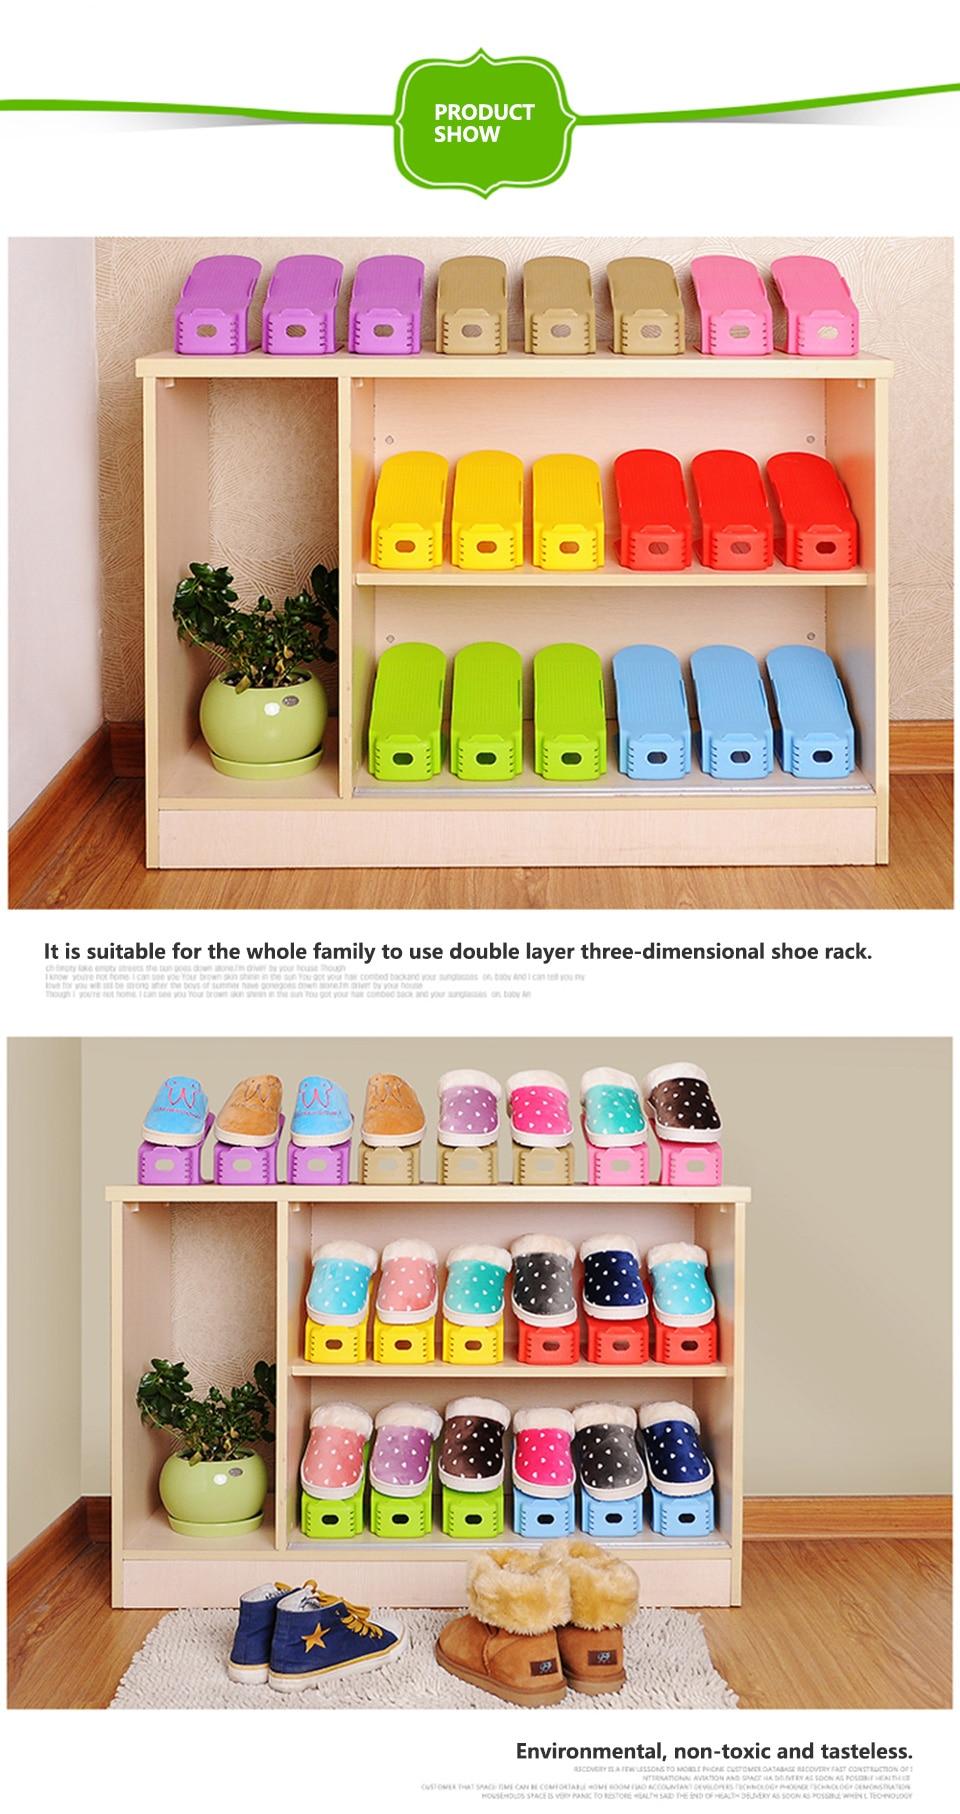 1pc Shoes Organizers Display Rack Shoes Organizer Plastic Space Saving Shoe Storage Shoe Racks Double Cleaning Storage_05